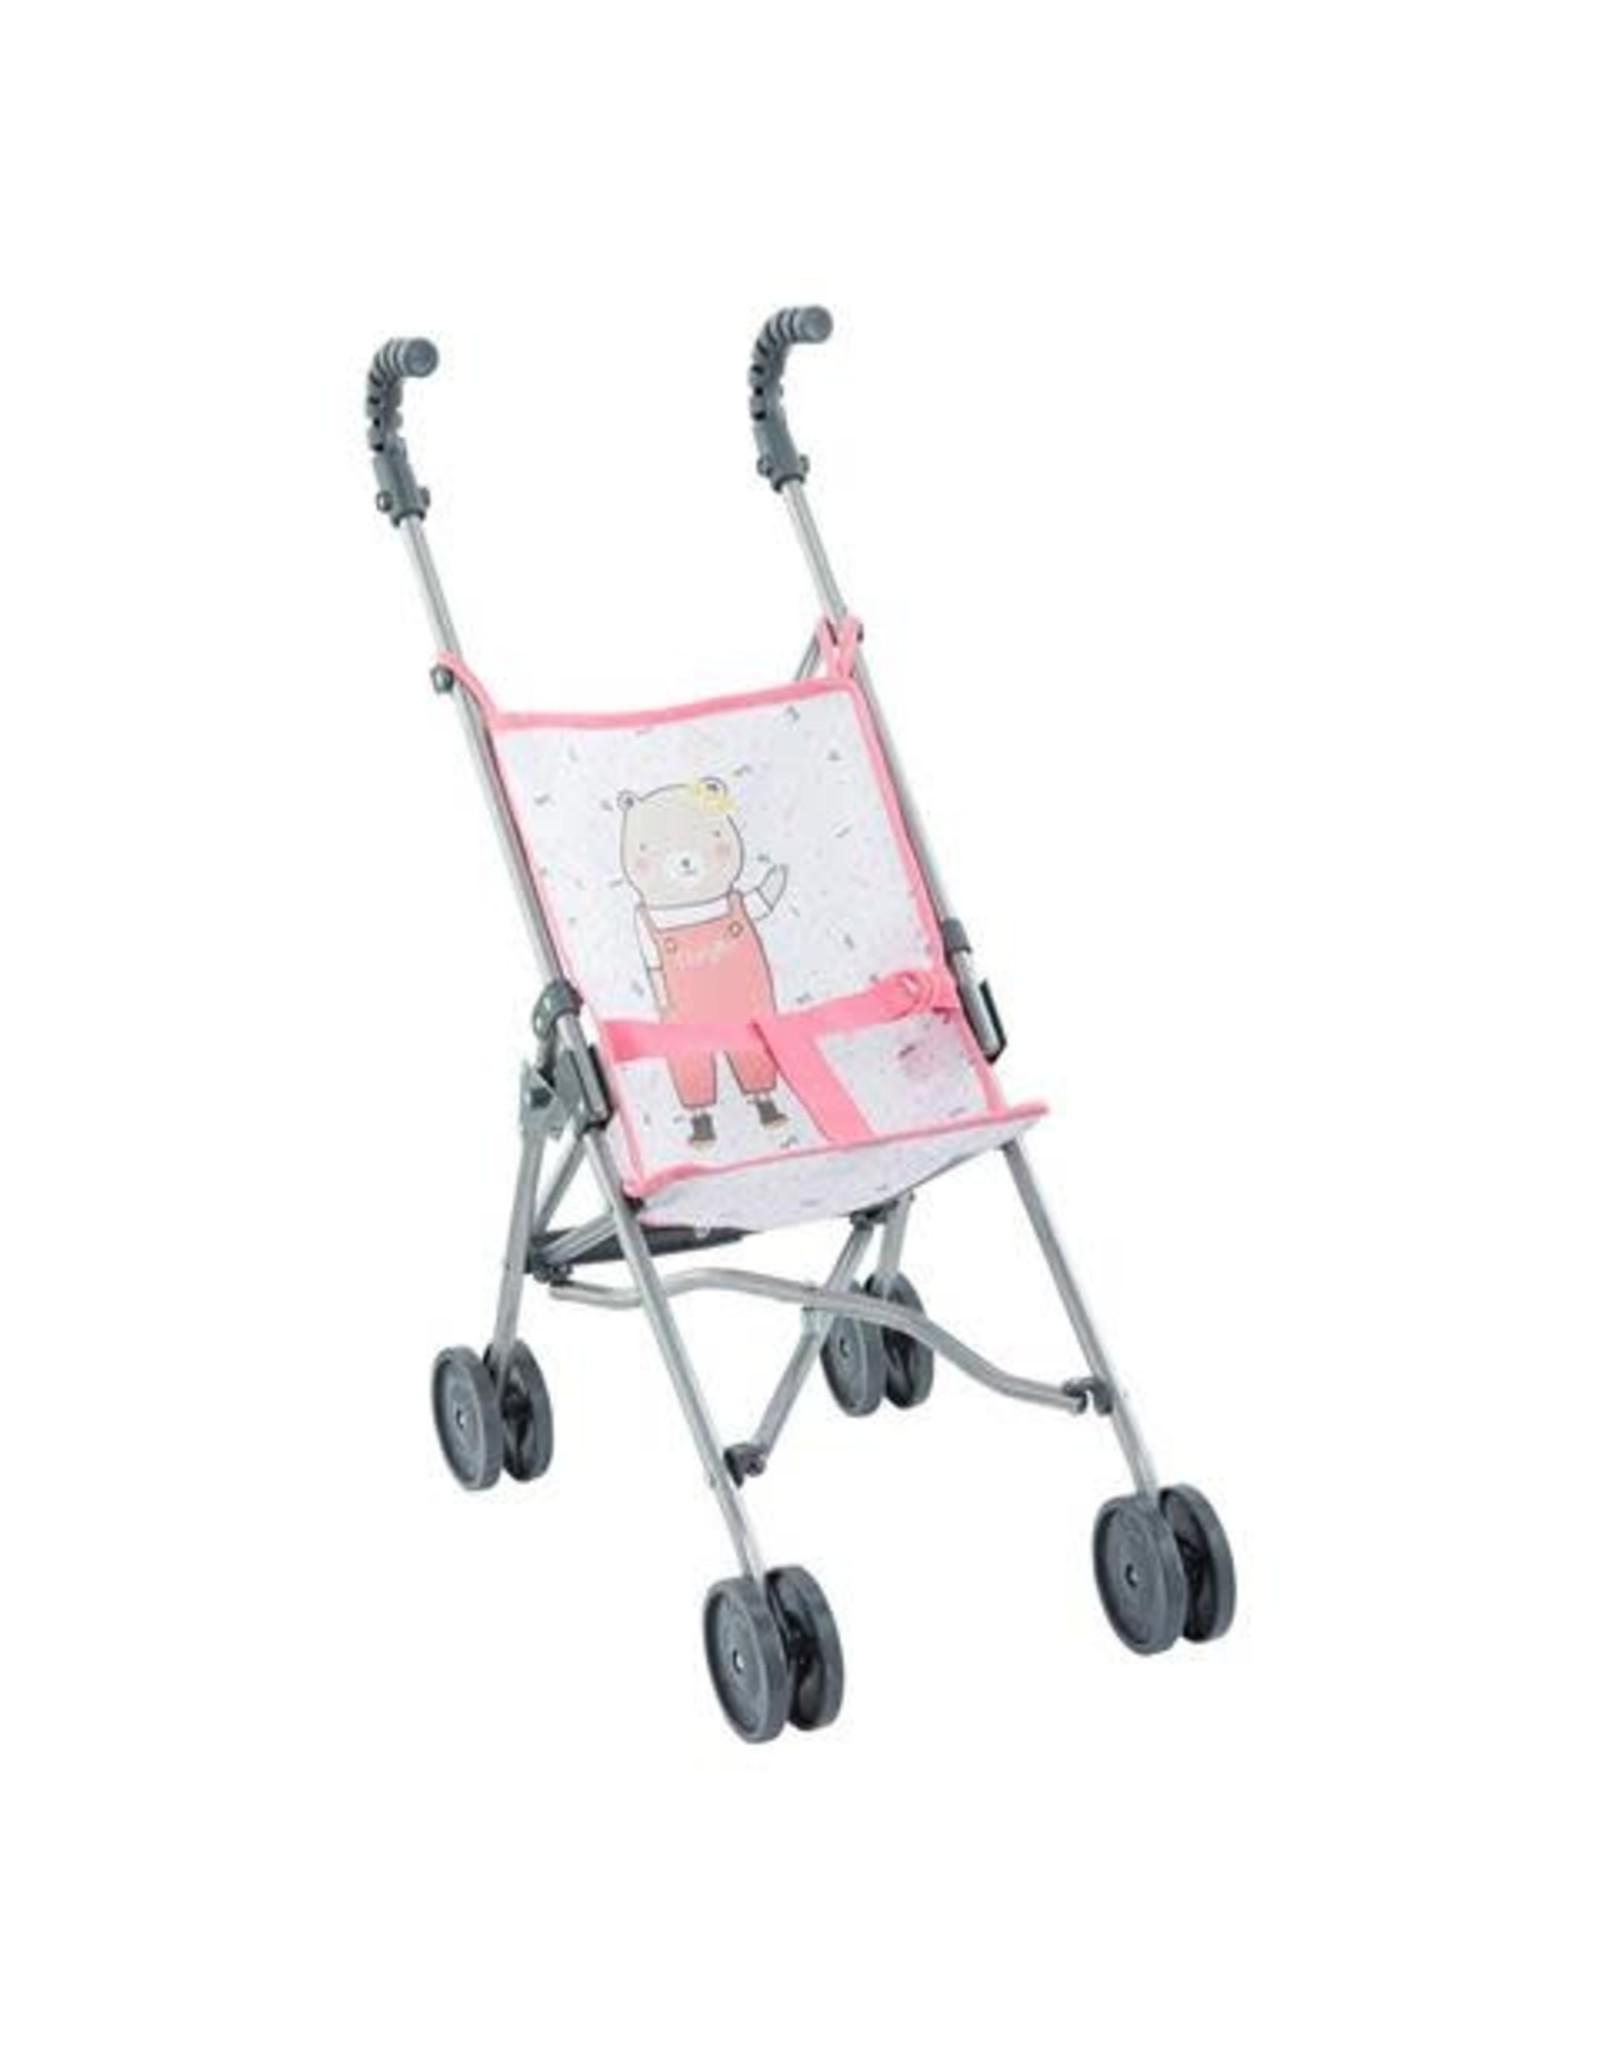 "Corolle BB14"" & 17"" & 20"" Umbrella Stroller - Pink - NEW"